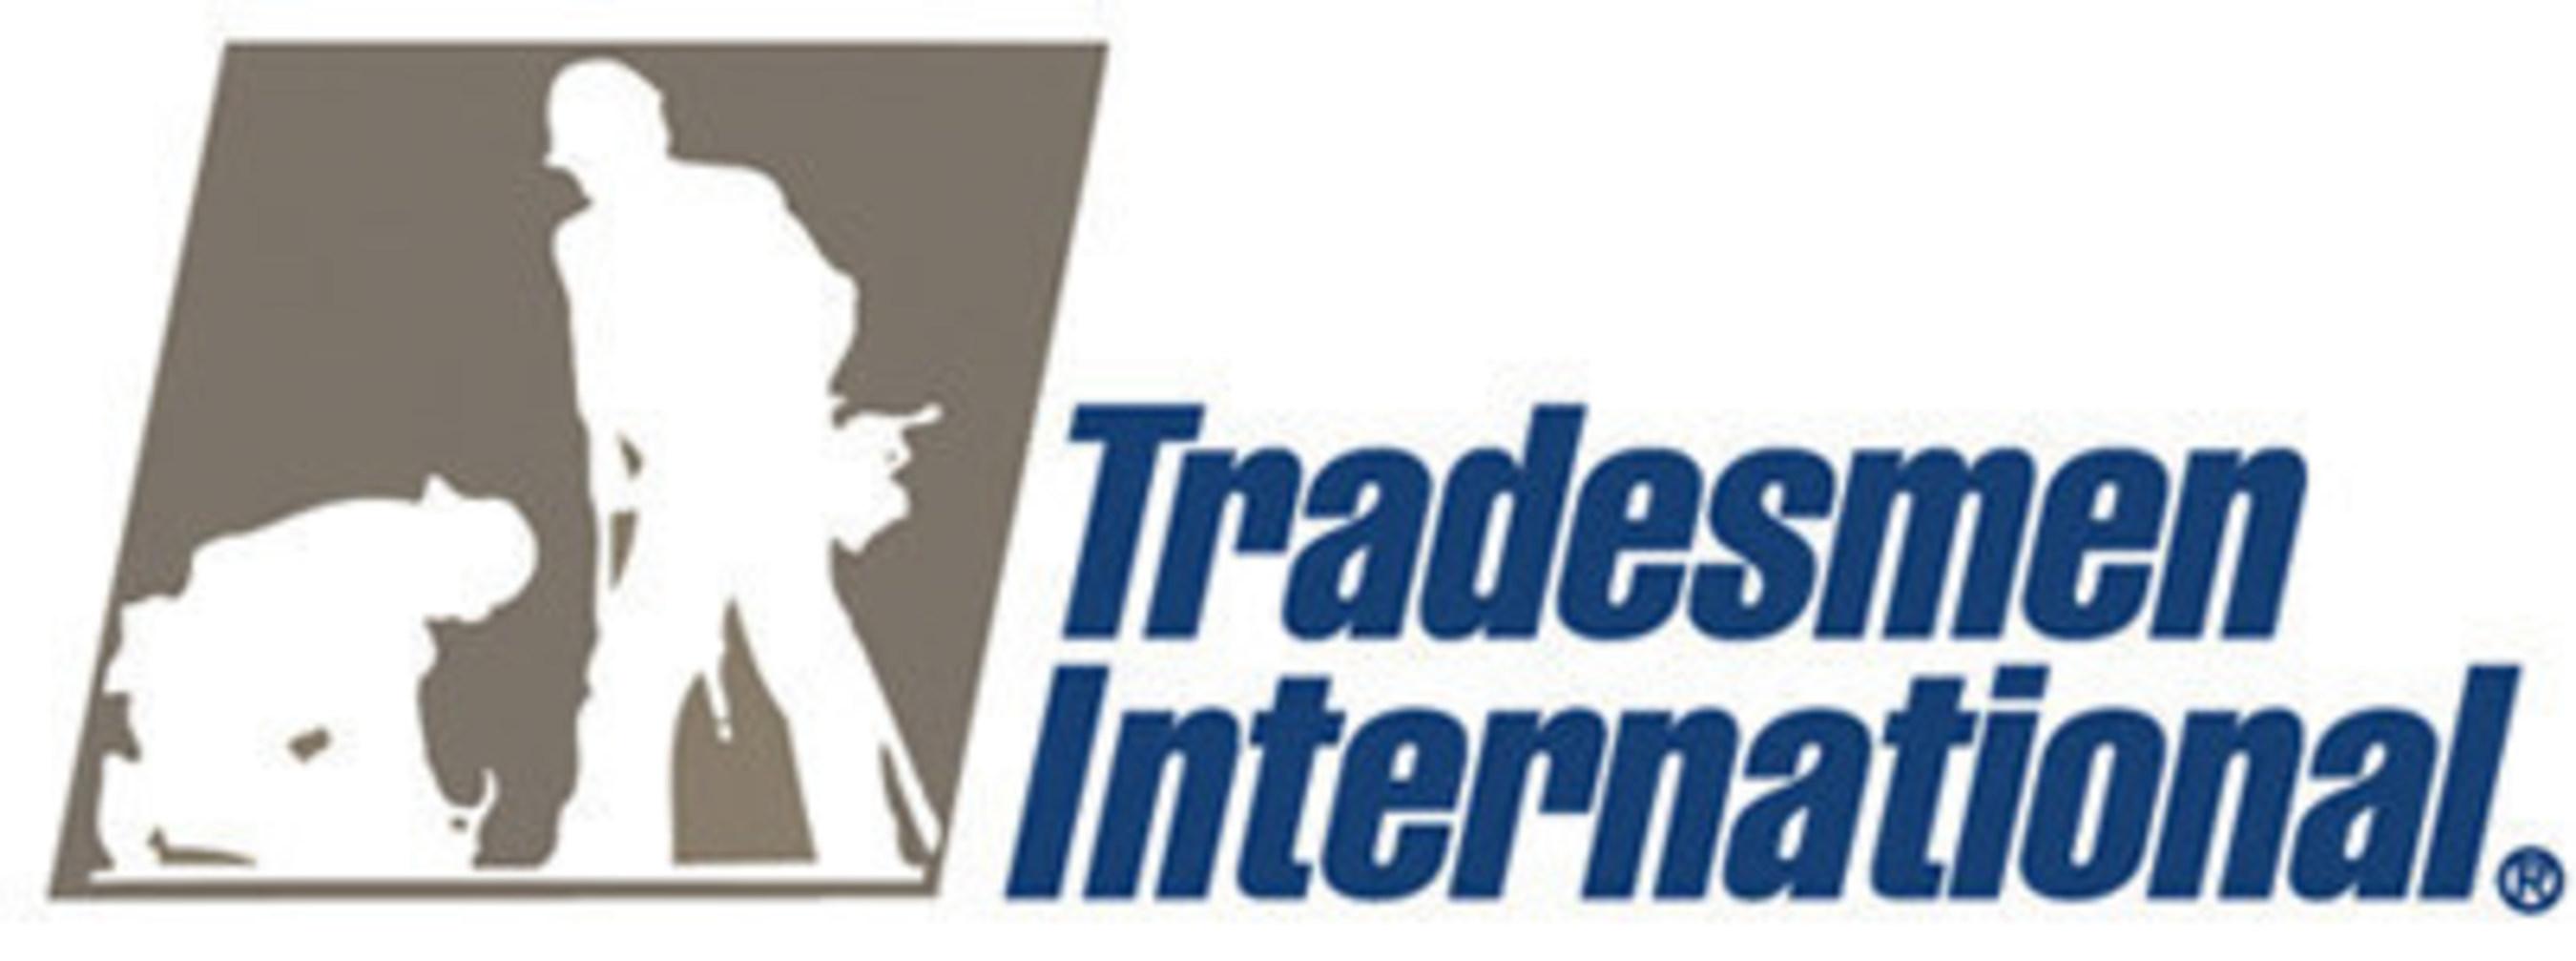 Online stock market trading brokers in india stock